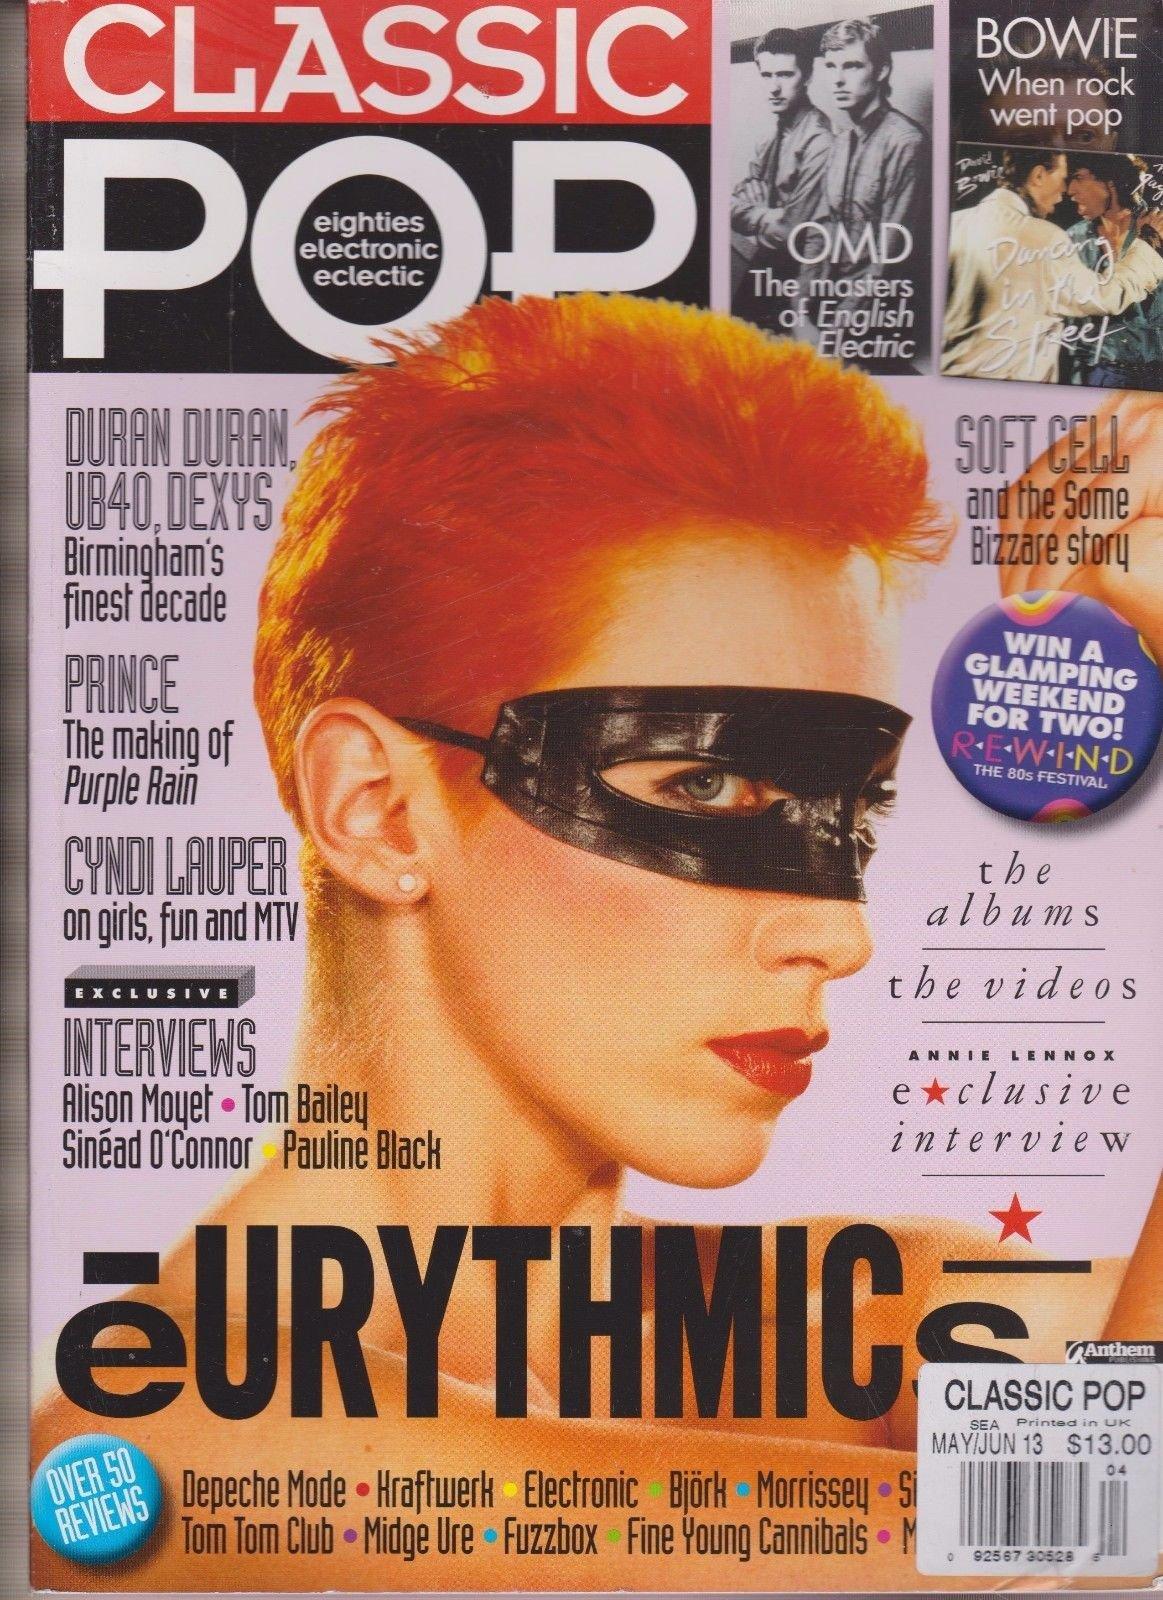 CLASSIC POP MAGAZINE EIGHTIES ELECTRONIC ECLECTIC MAY/JUNE 2013, EURTTHMICS.